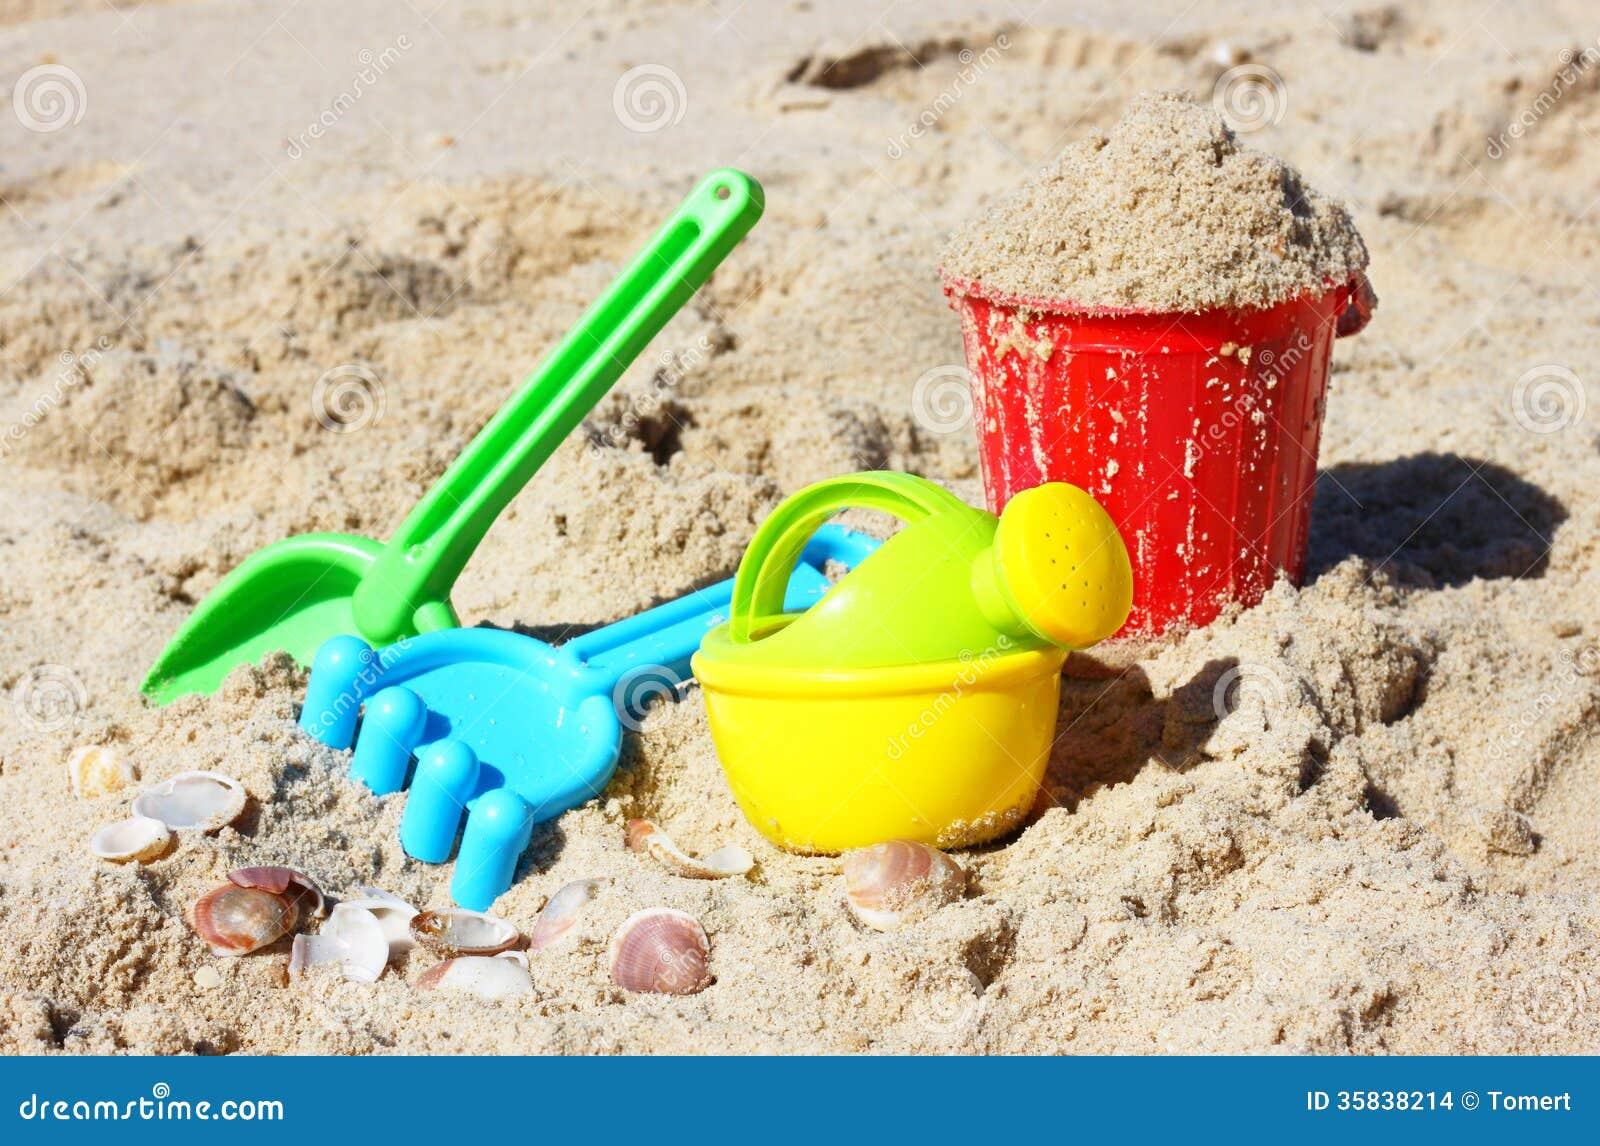 Beach Sand Toys For Kids : Children s beach toys bucket spade and shovel on sand